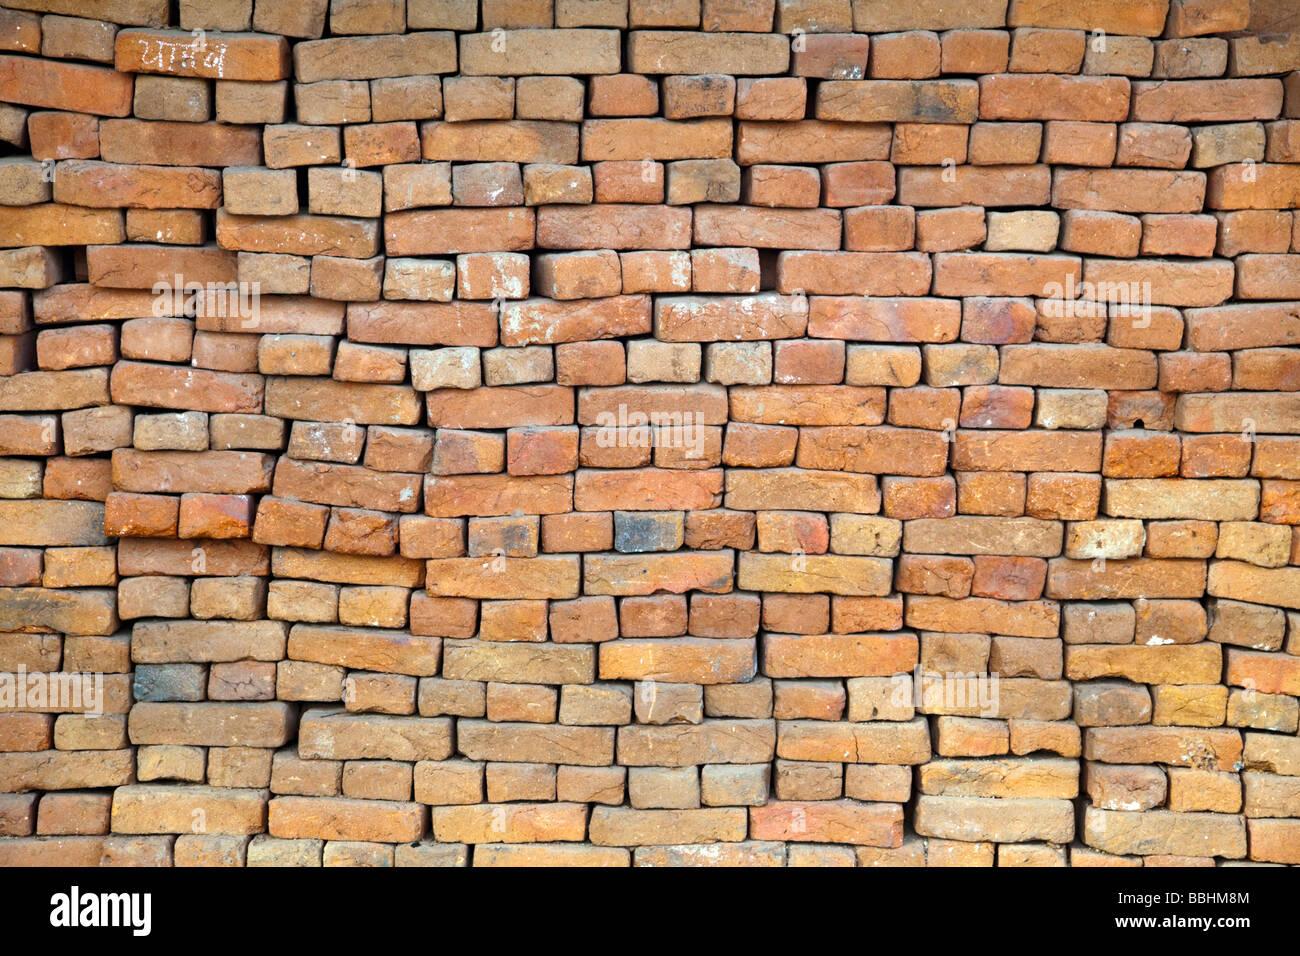 Precarious brick wall - Stock Image